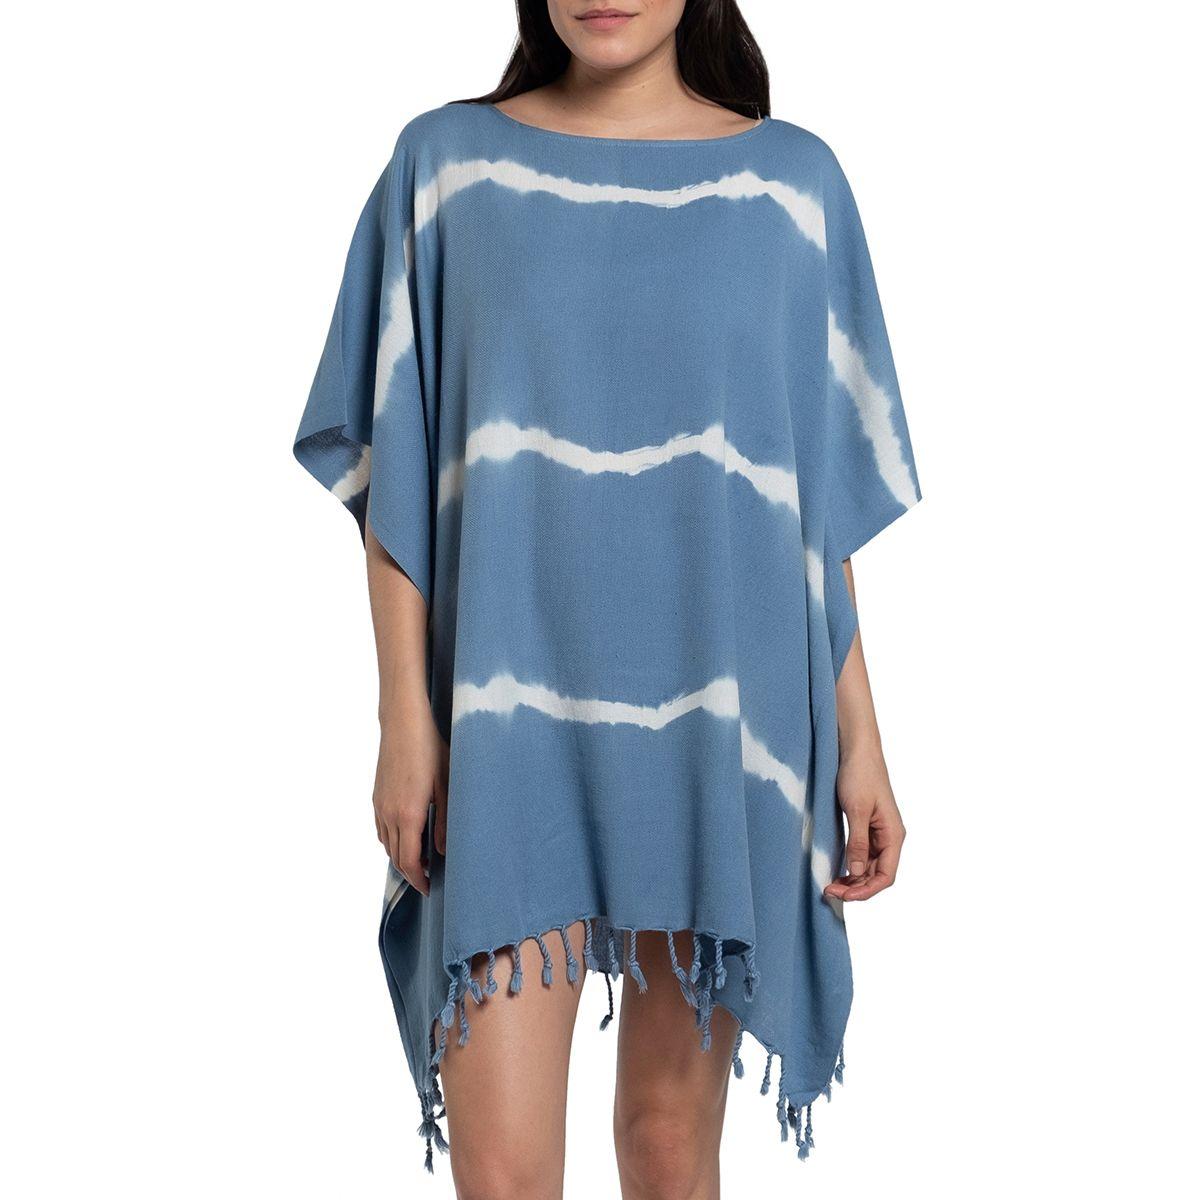 Tunic Daisy / Tie Dye - Base Air Blue